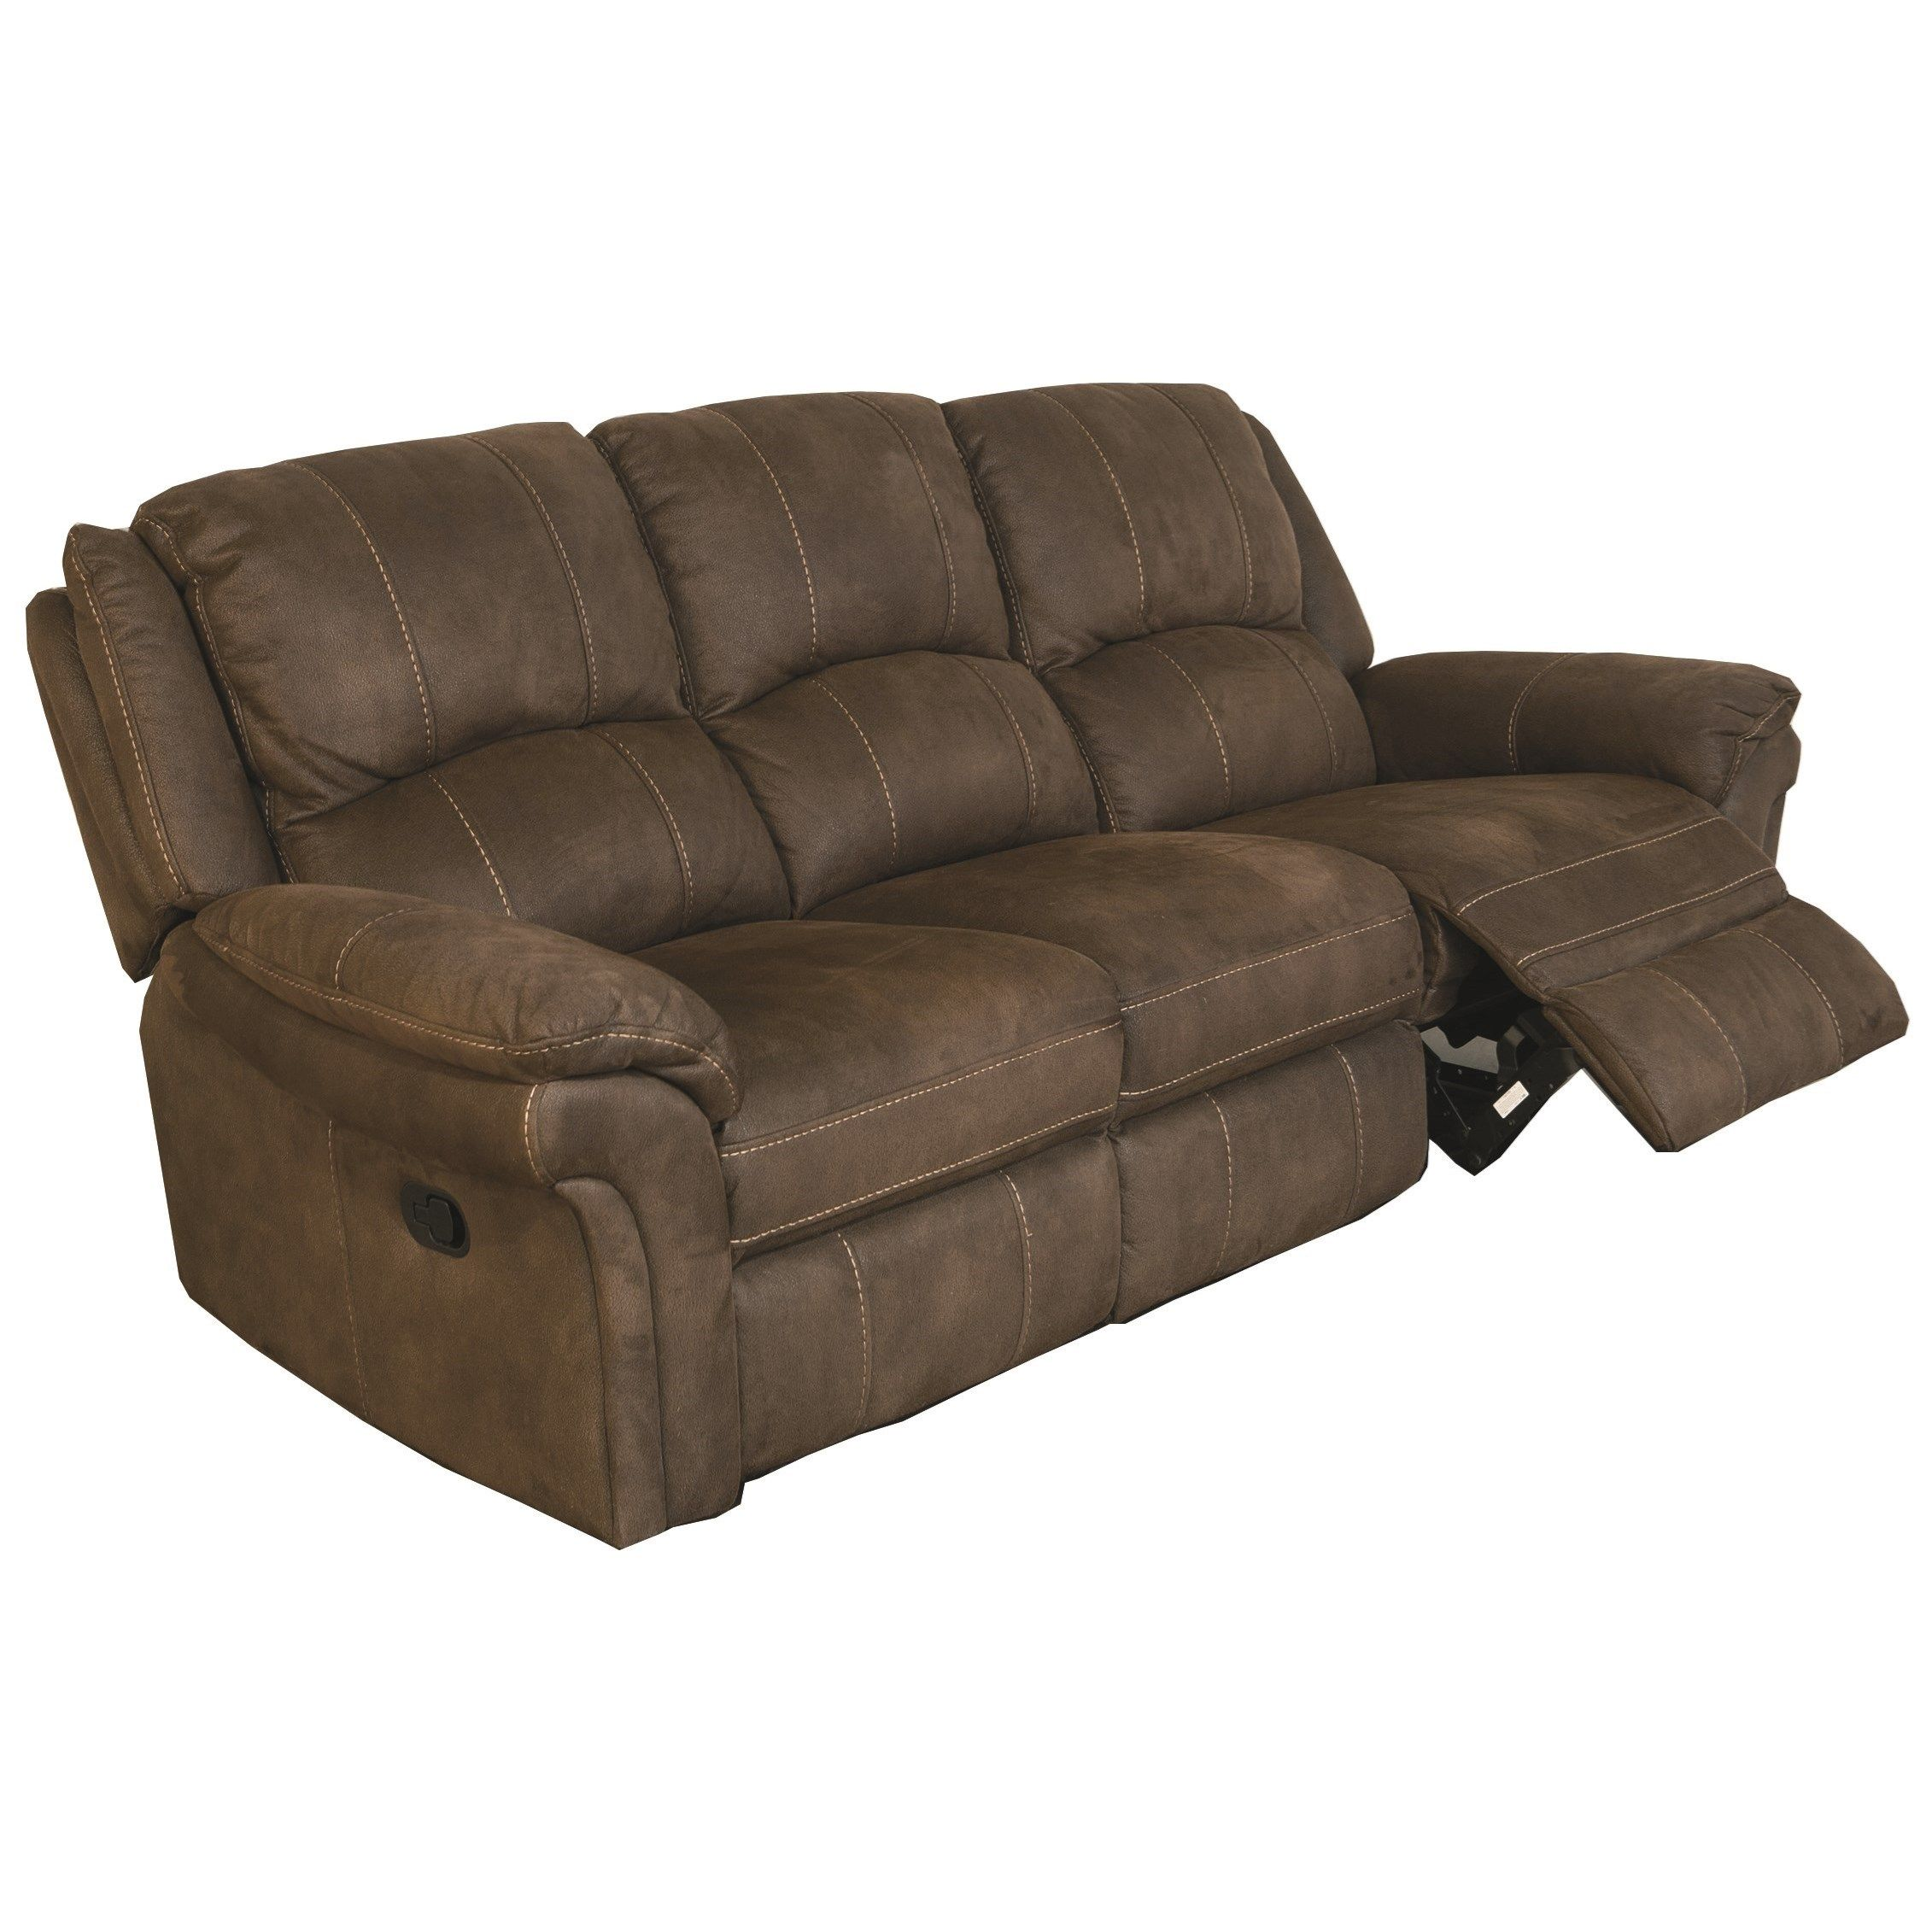 Awe Inspiring Boman Dual Reclining Sofa By Cheers Sofa At John V Schultz Inzonedesignstudio Interior Chair Design Inzonedesignstudiocom